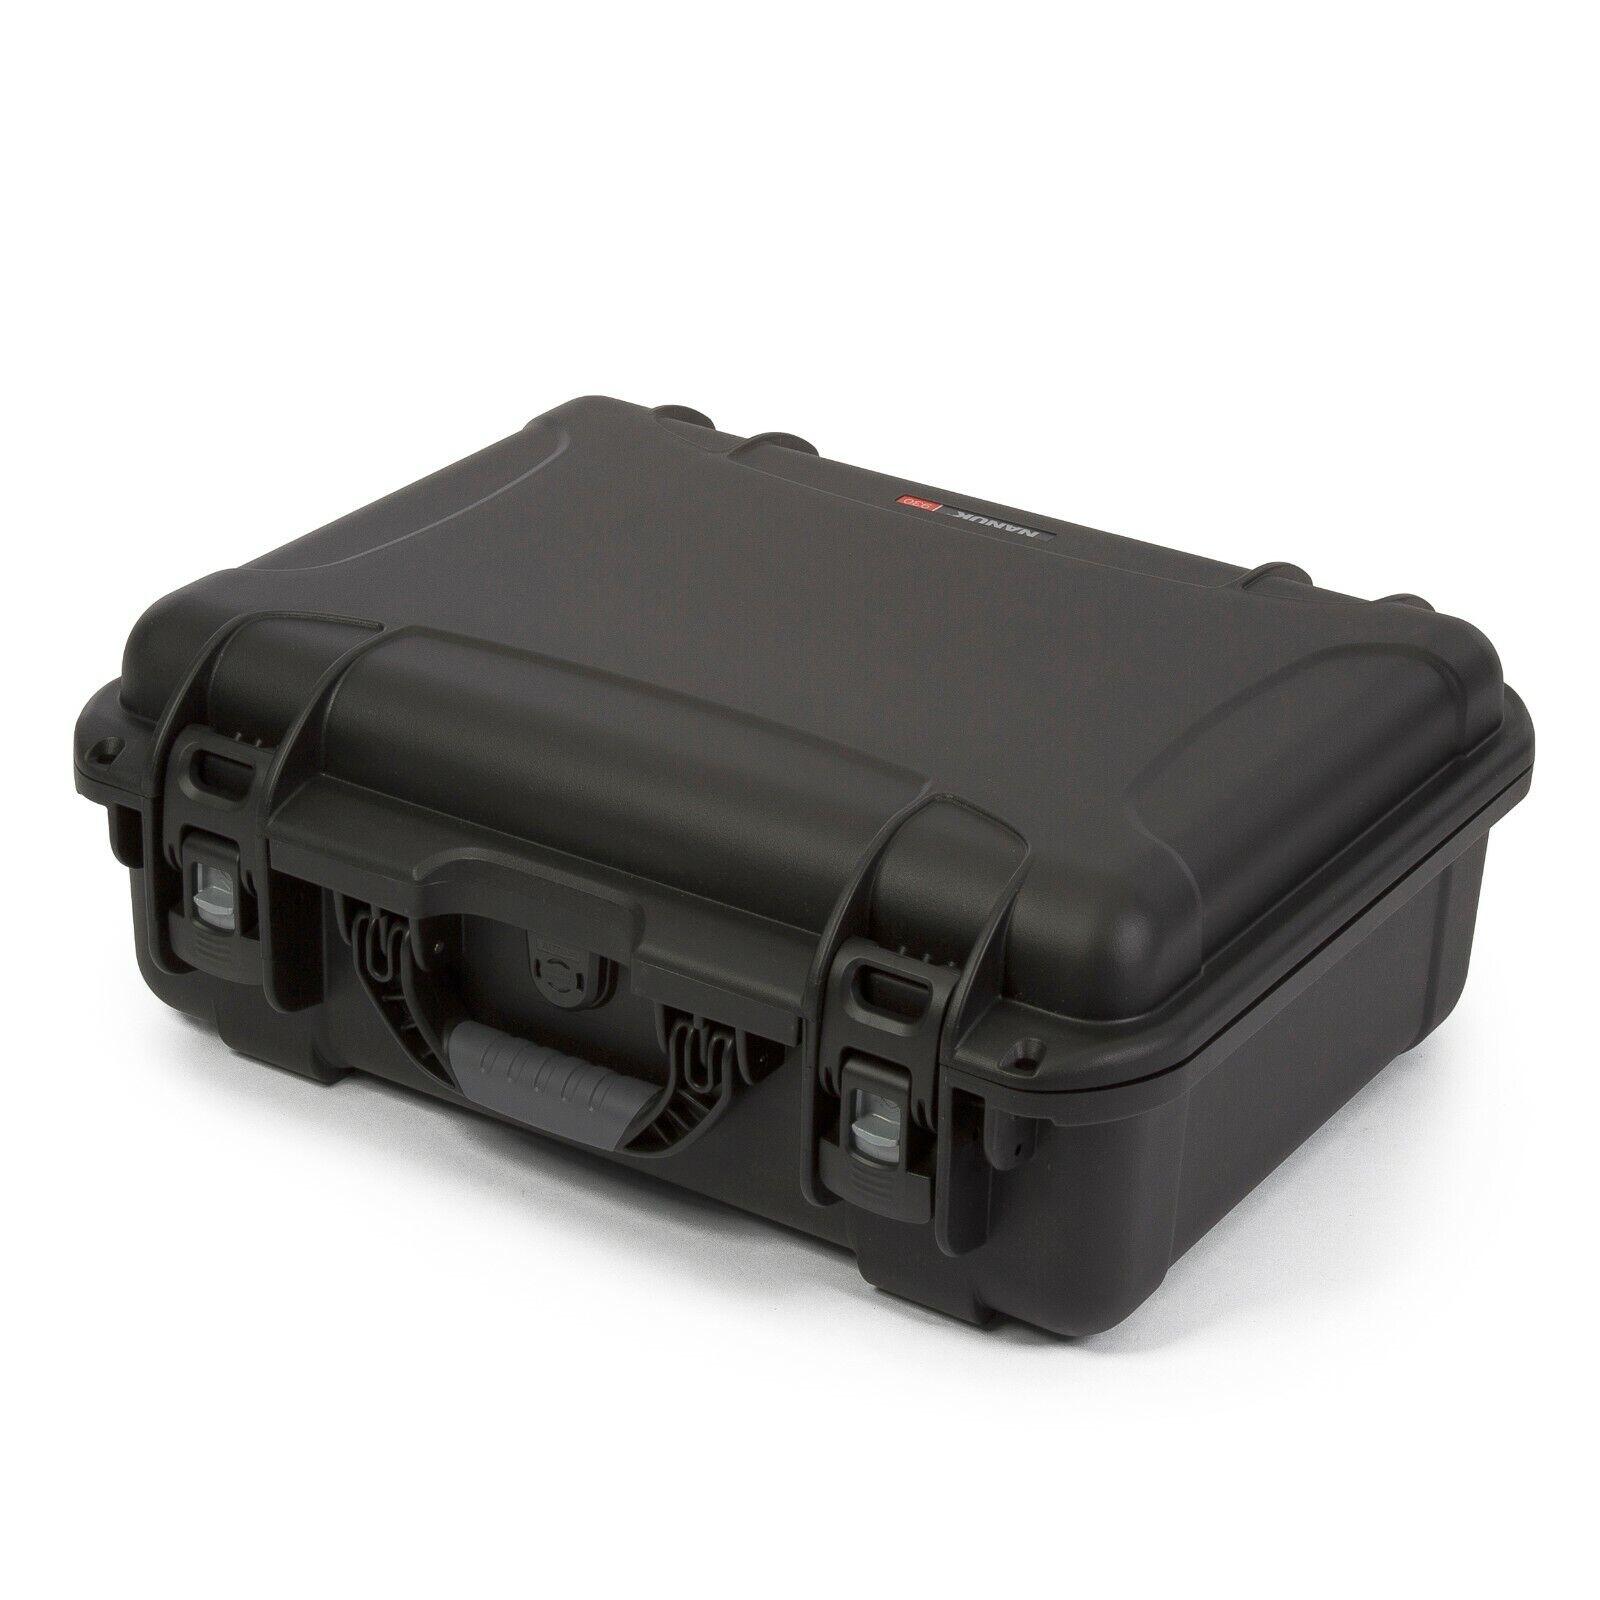 Nanuk 930 hard case,NO FOAM SET,crush proof,water proof,dust proof,NEW case